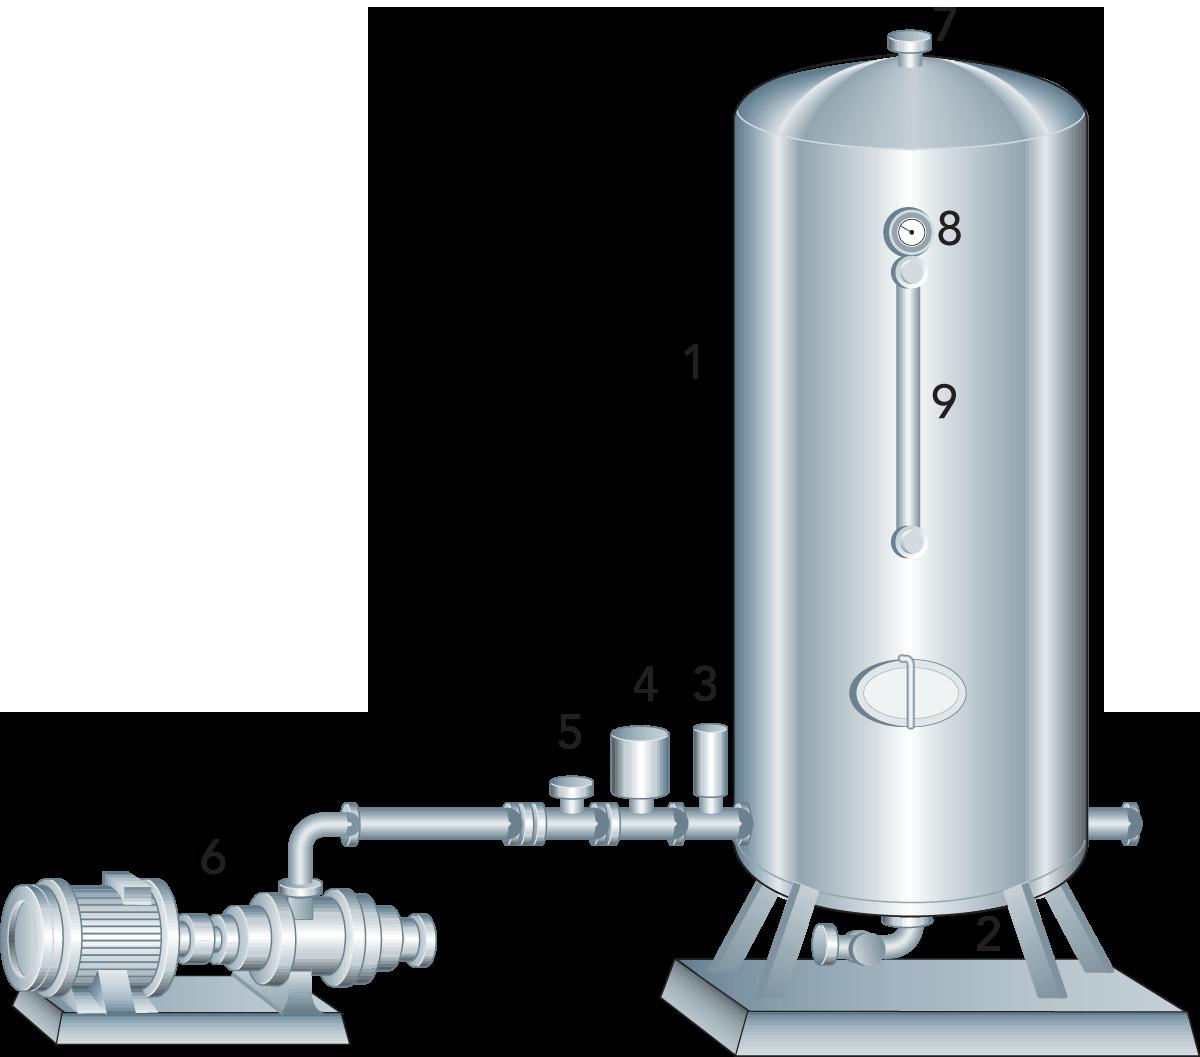 Service systems | Dairy Processing Handbook